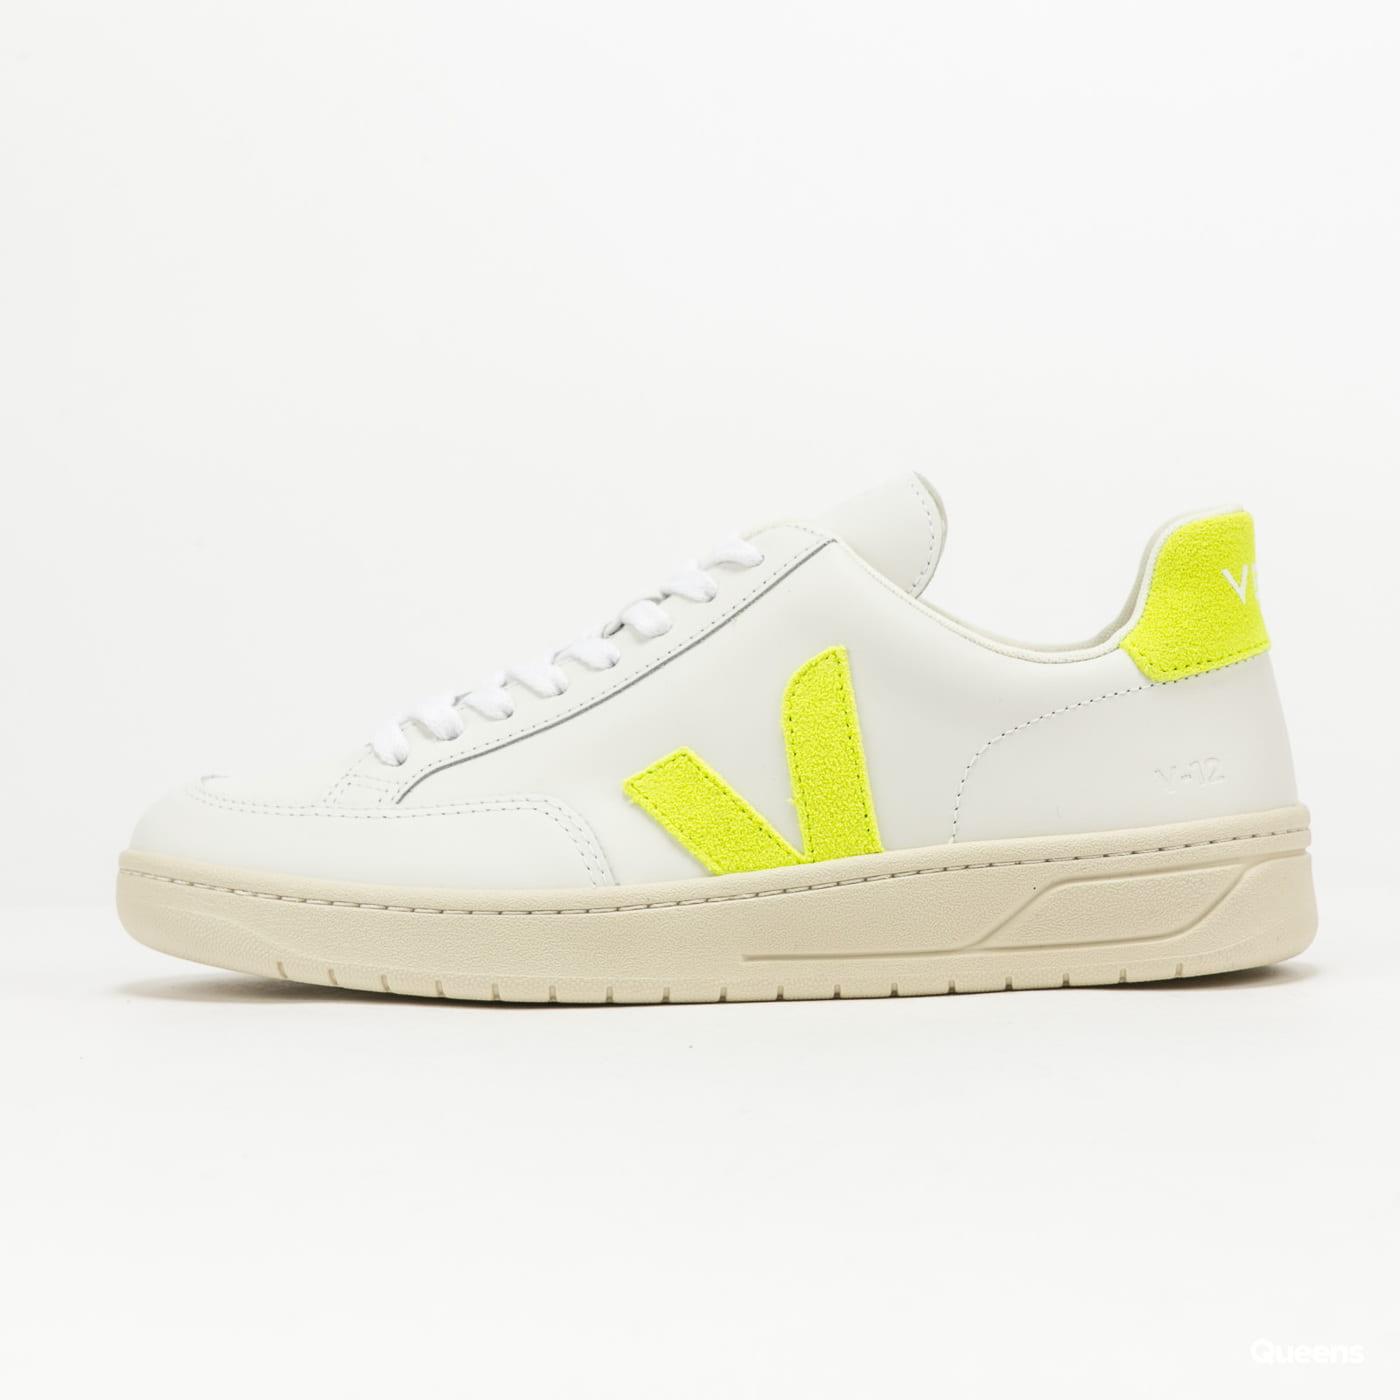 VEJA V-12 Leather extra-white_jaune-fluo